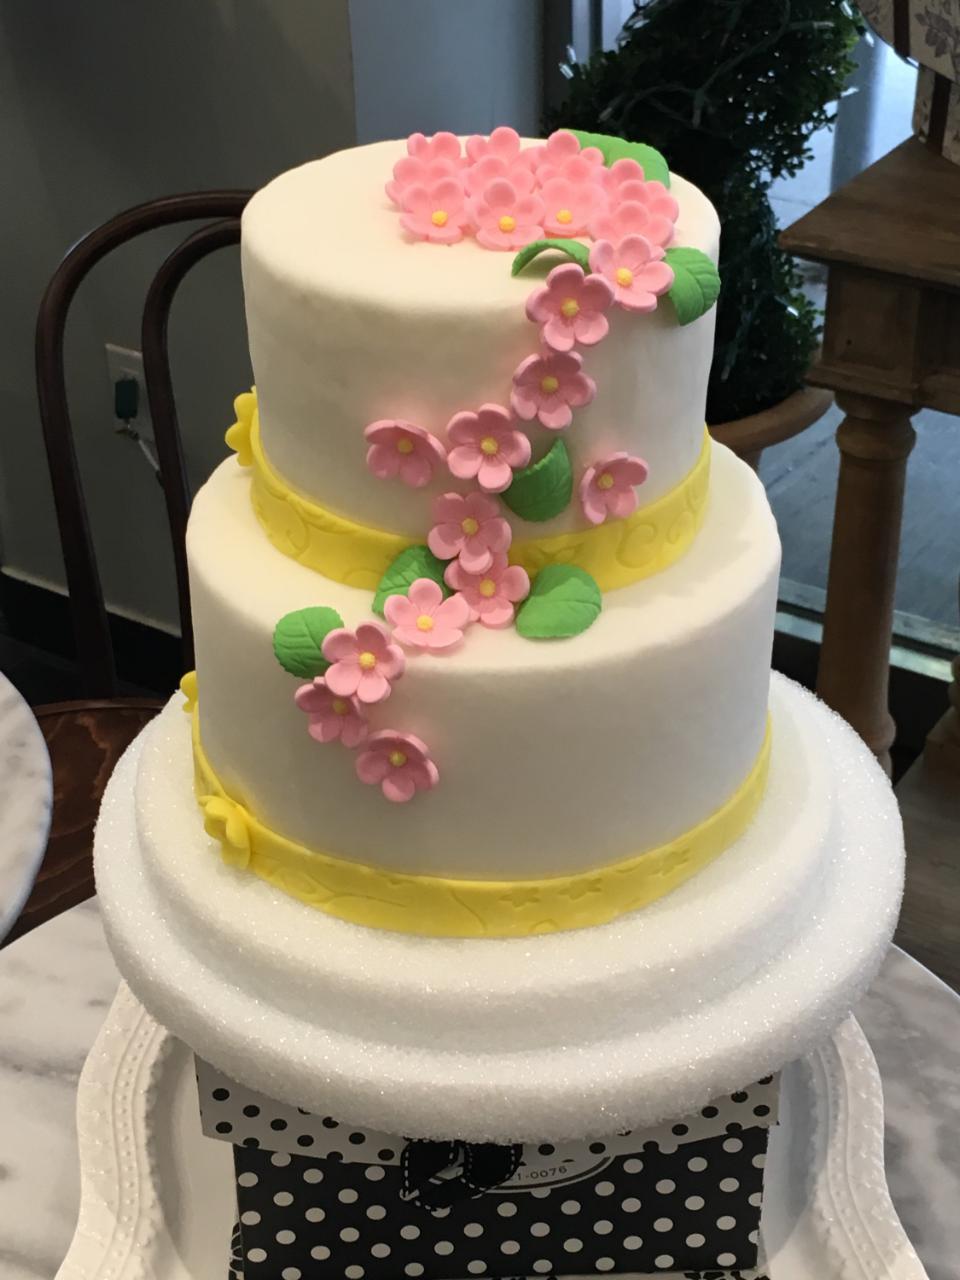 Mother's Day 2-tier cake.jpg